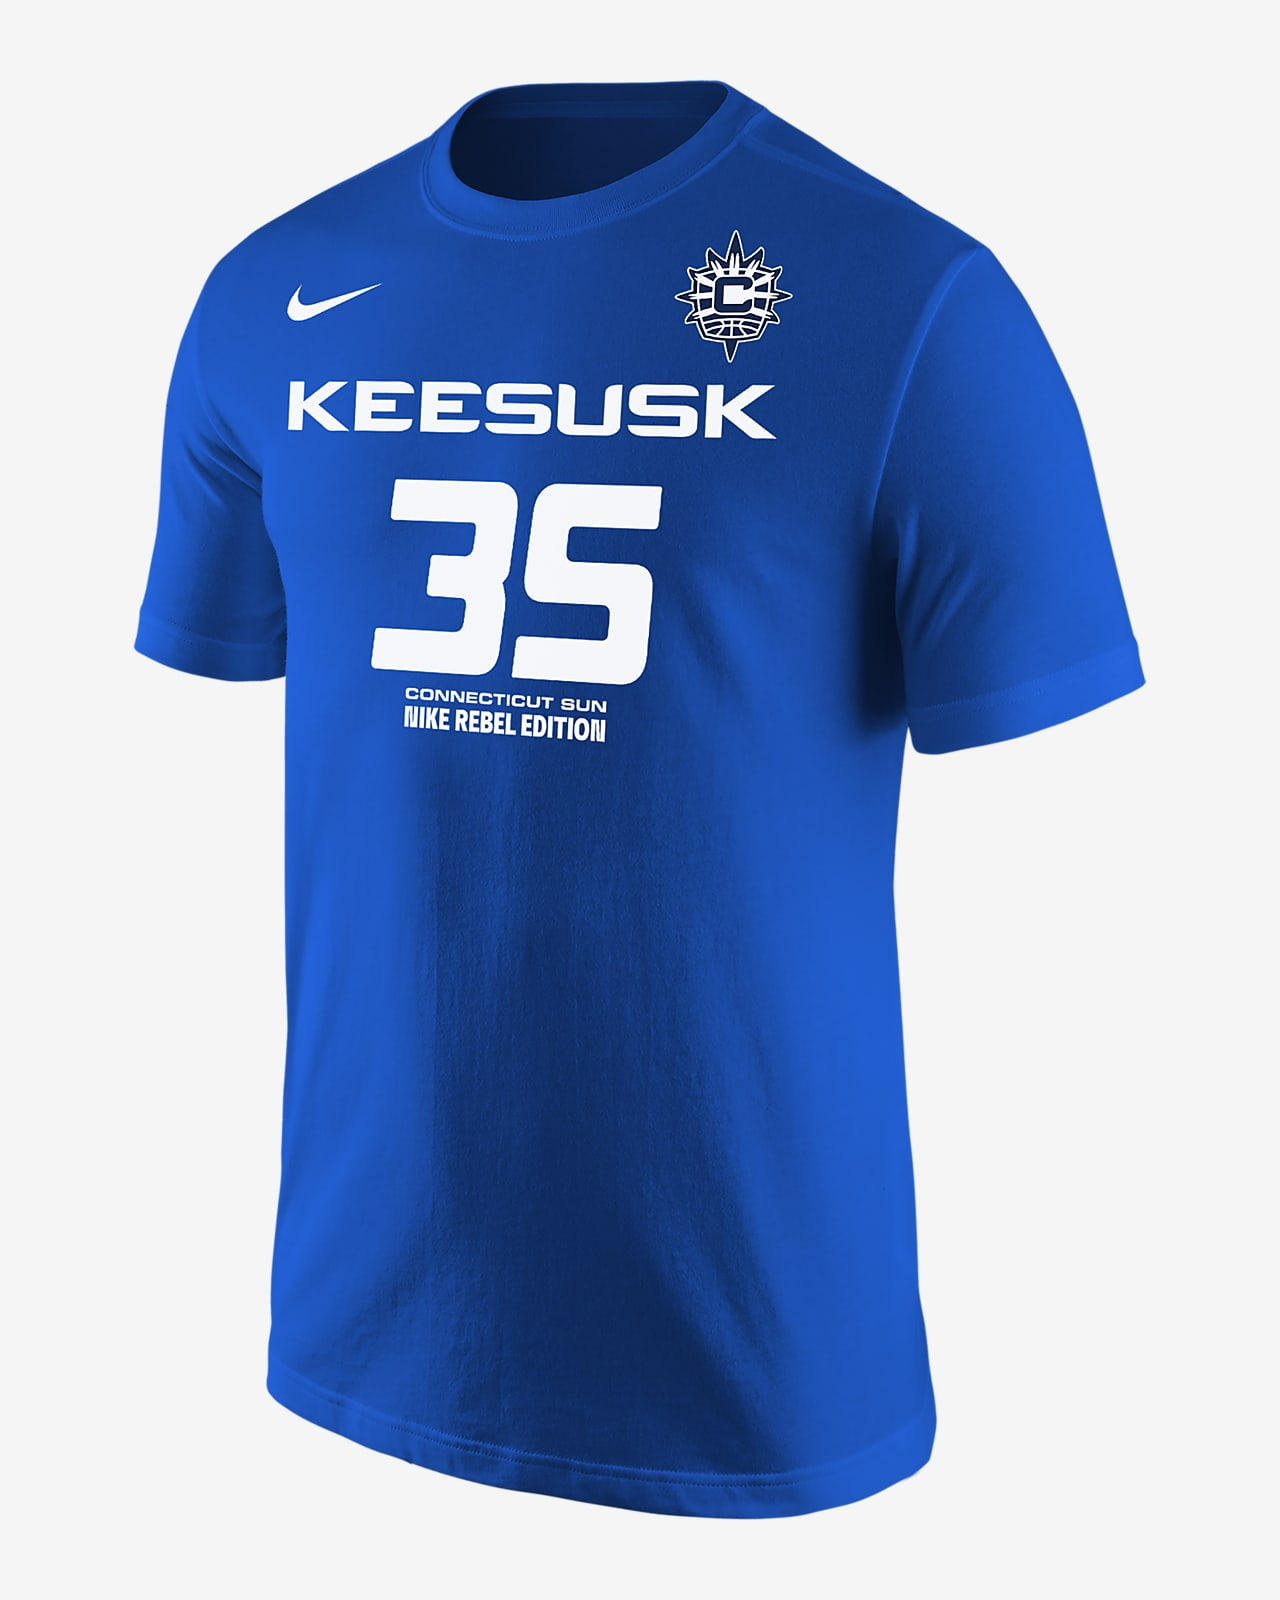 Jonquel Jones Sun Rebel Edition Nike WNBA T-Shirt